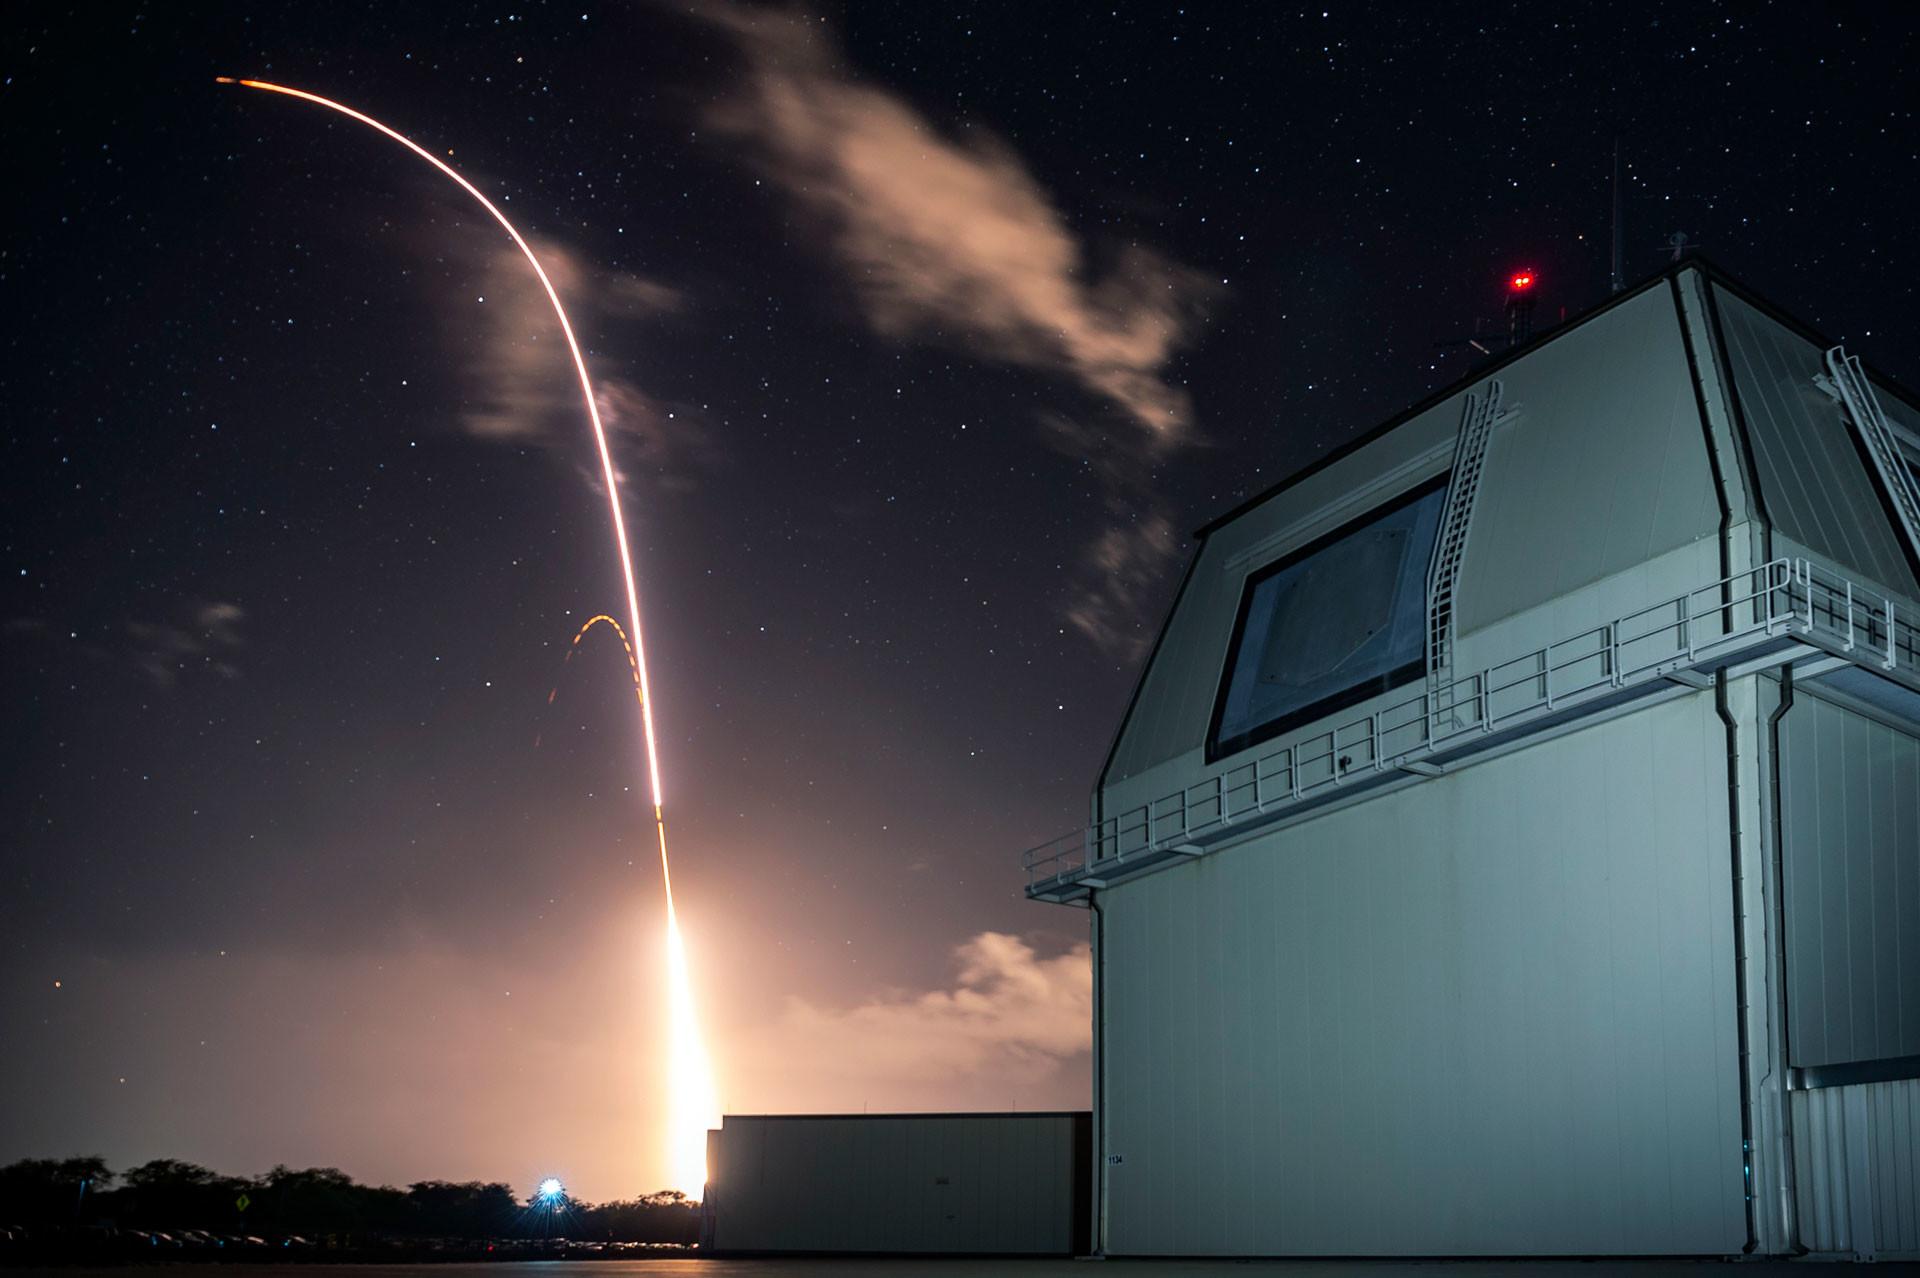 <p>Фото: &copy;&nbsp;<span>Mark Wright/Missile Defense Agency via AP</span></p>